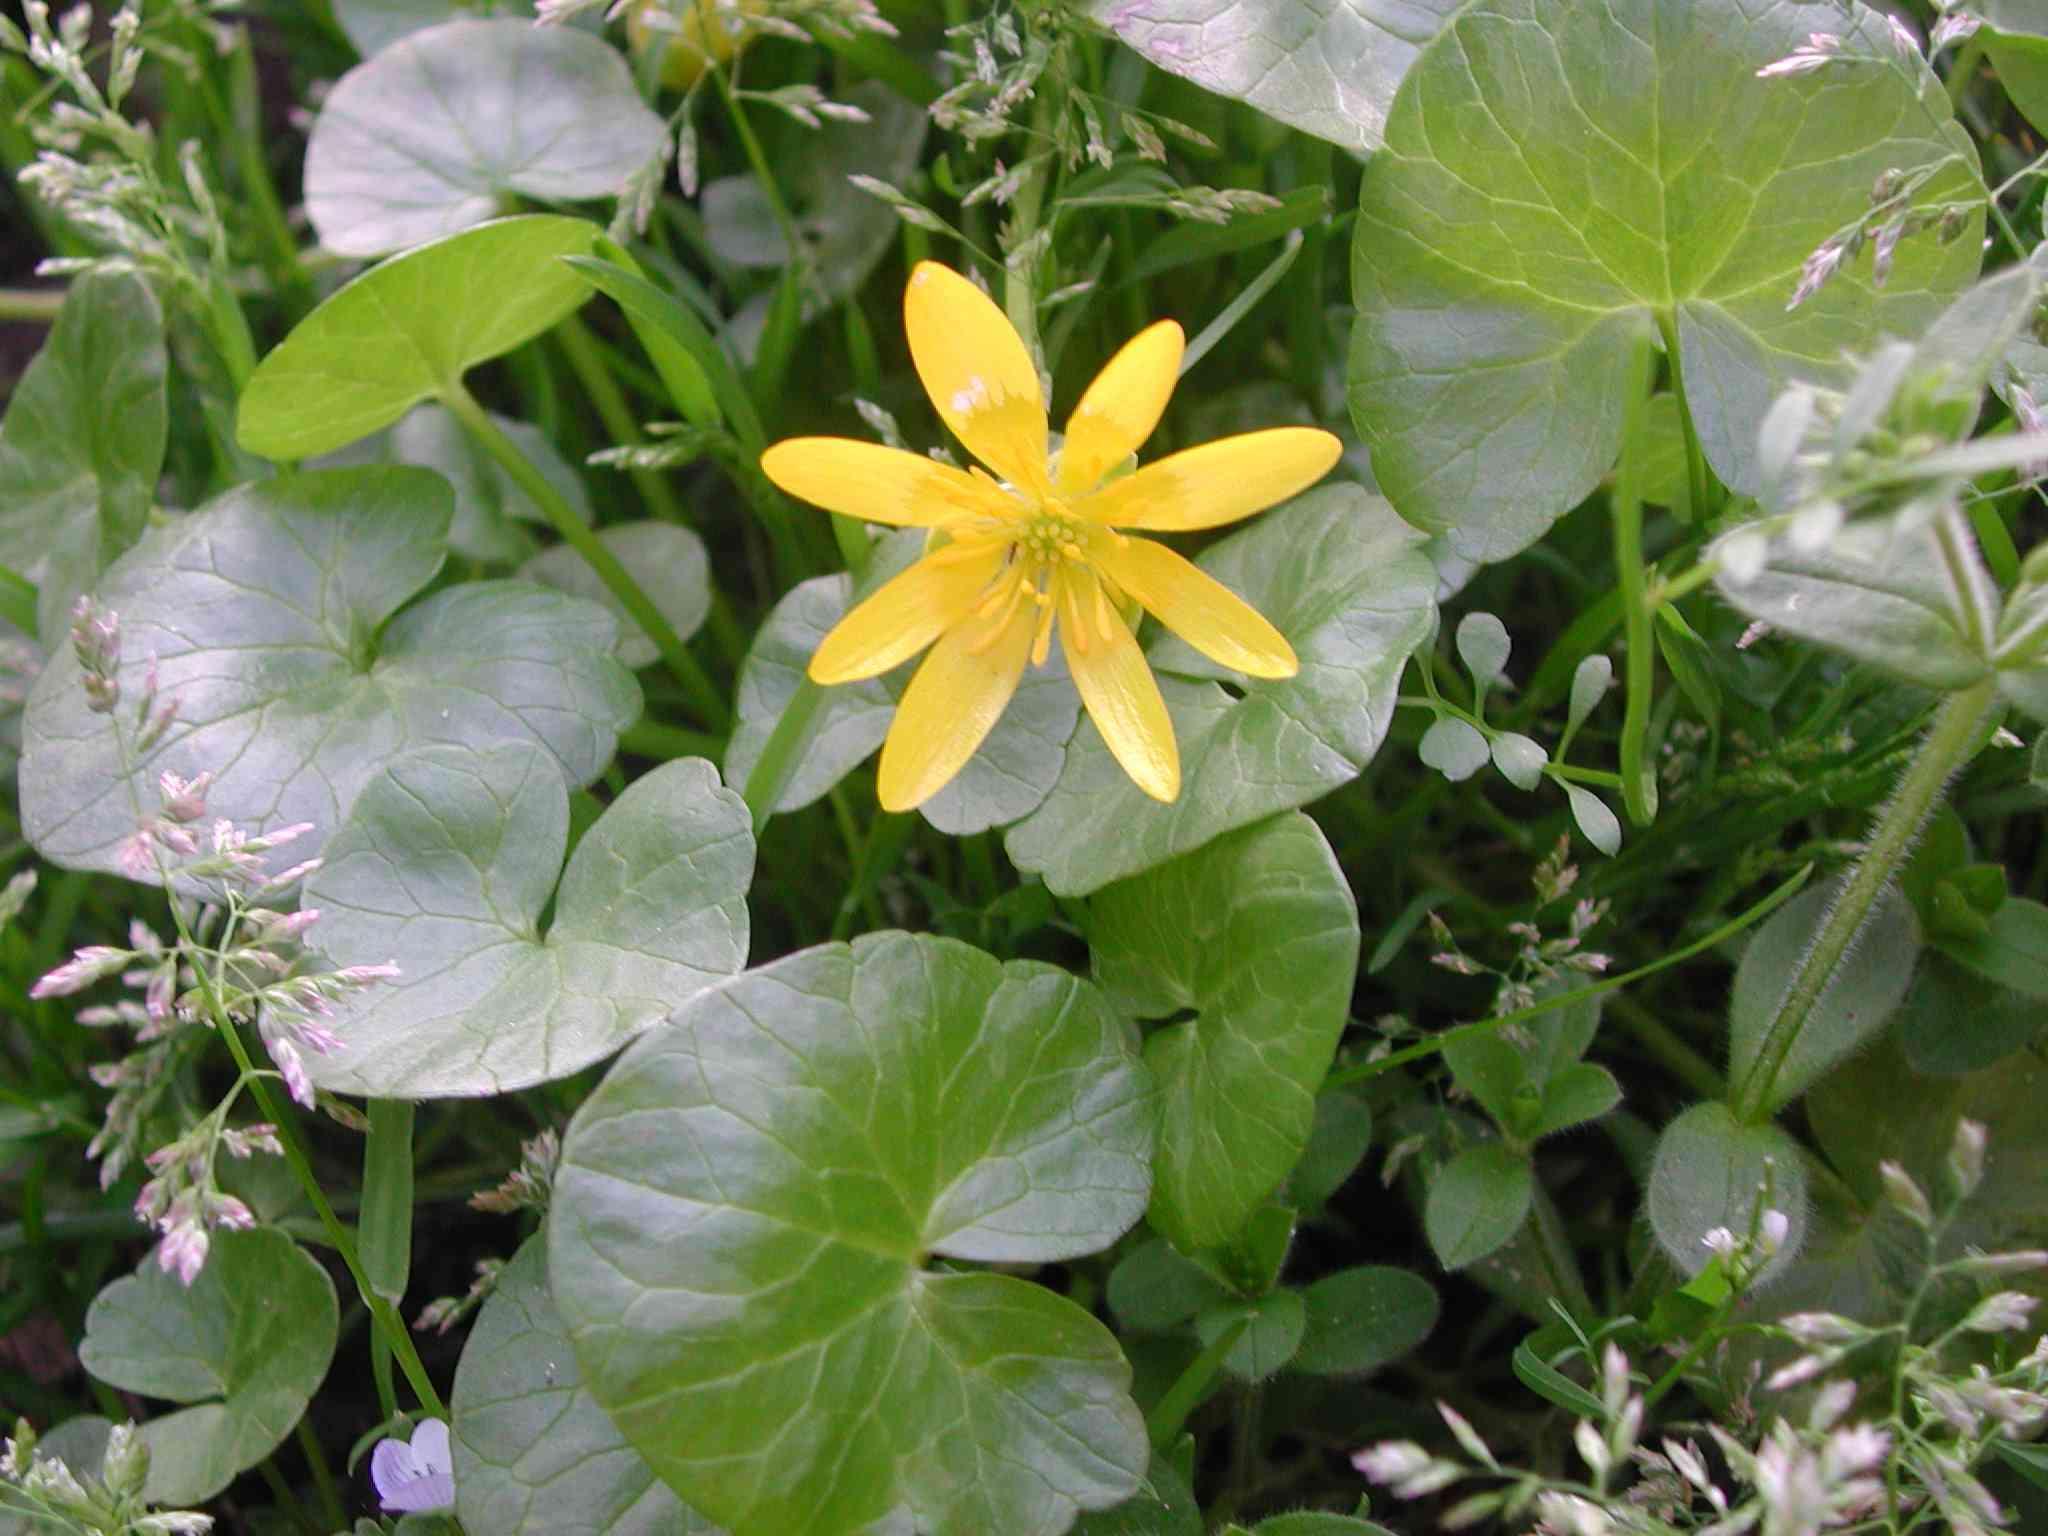 fiori gialli marzo